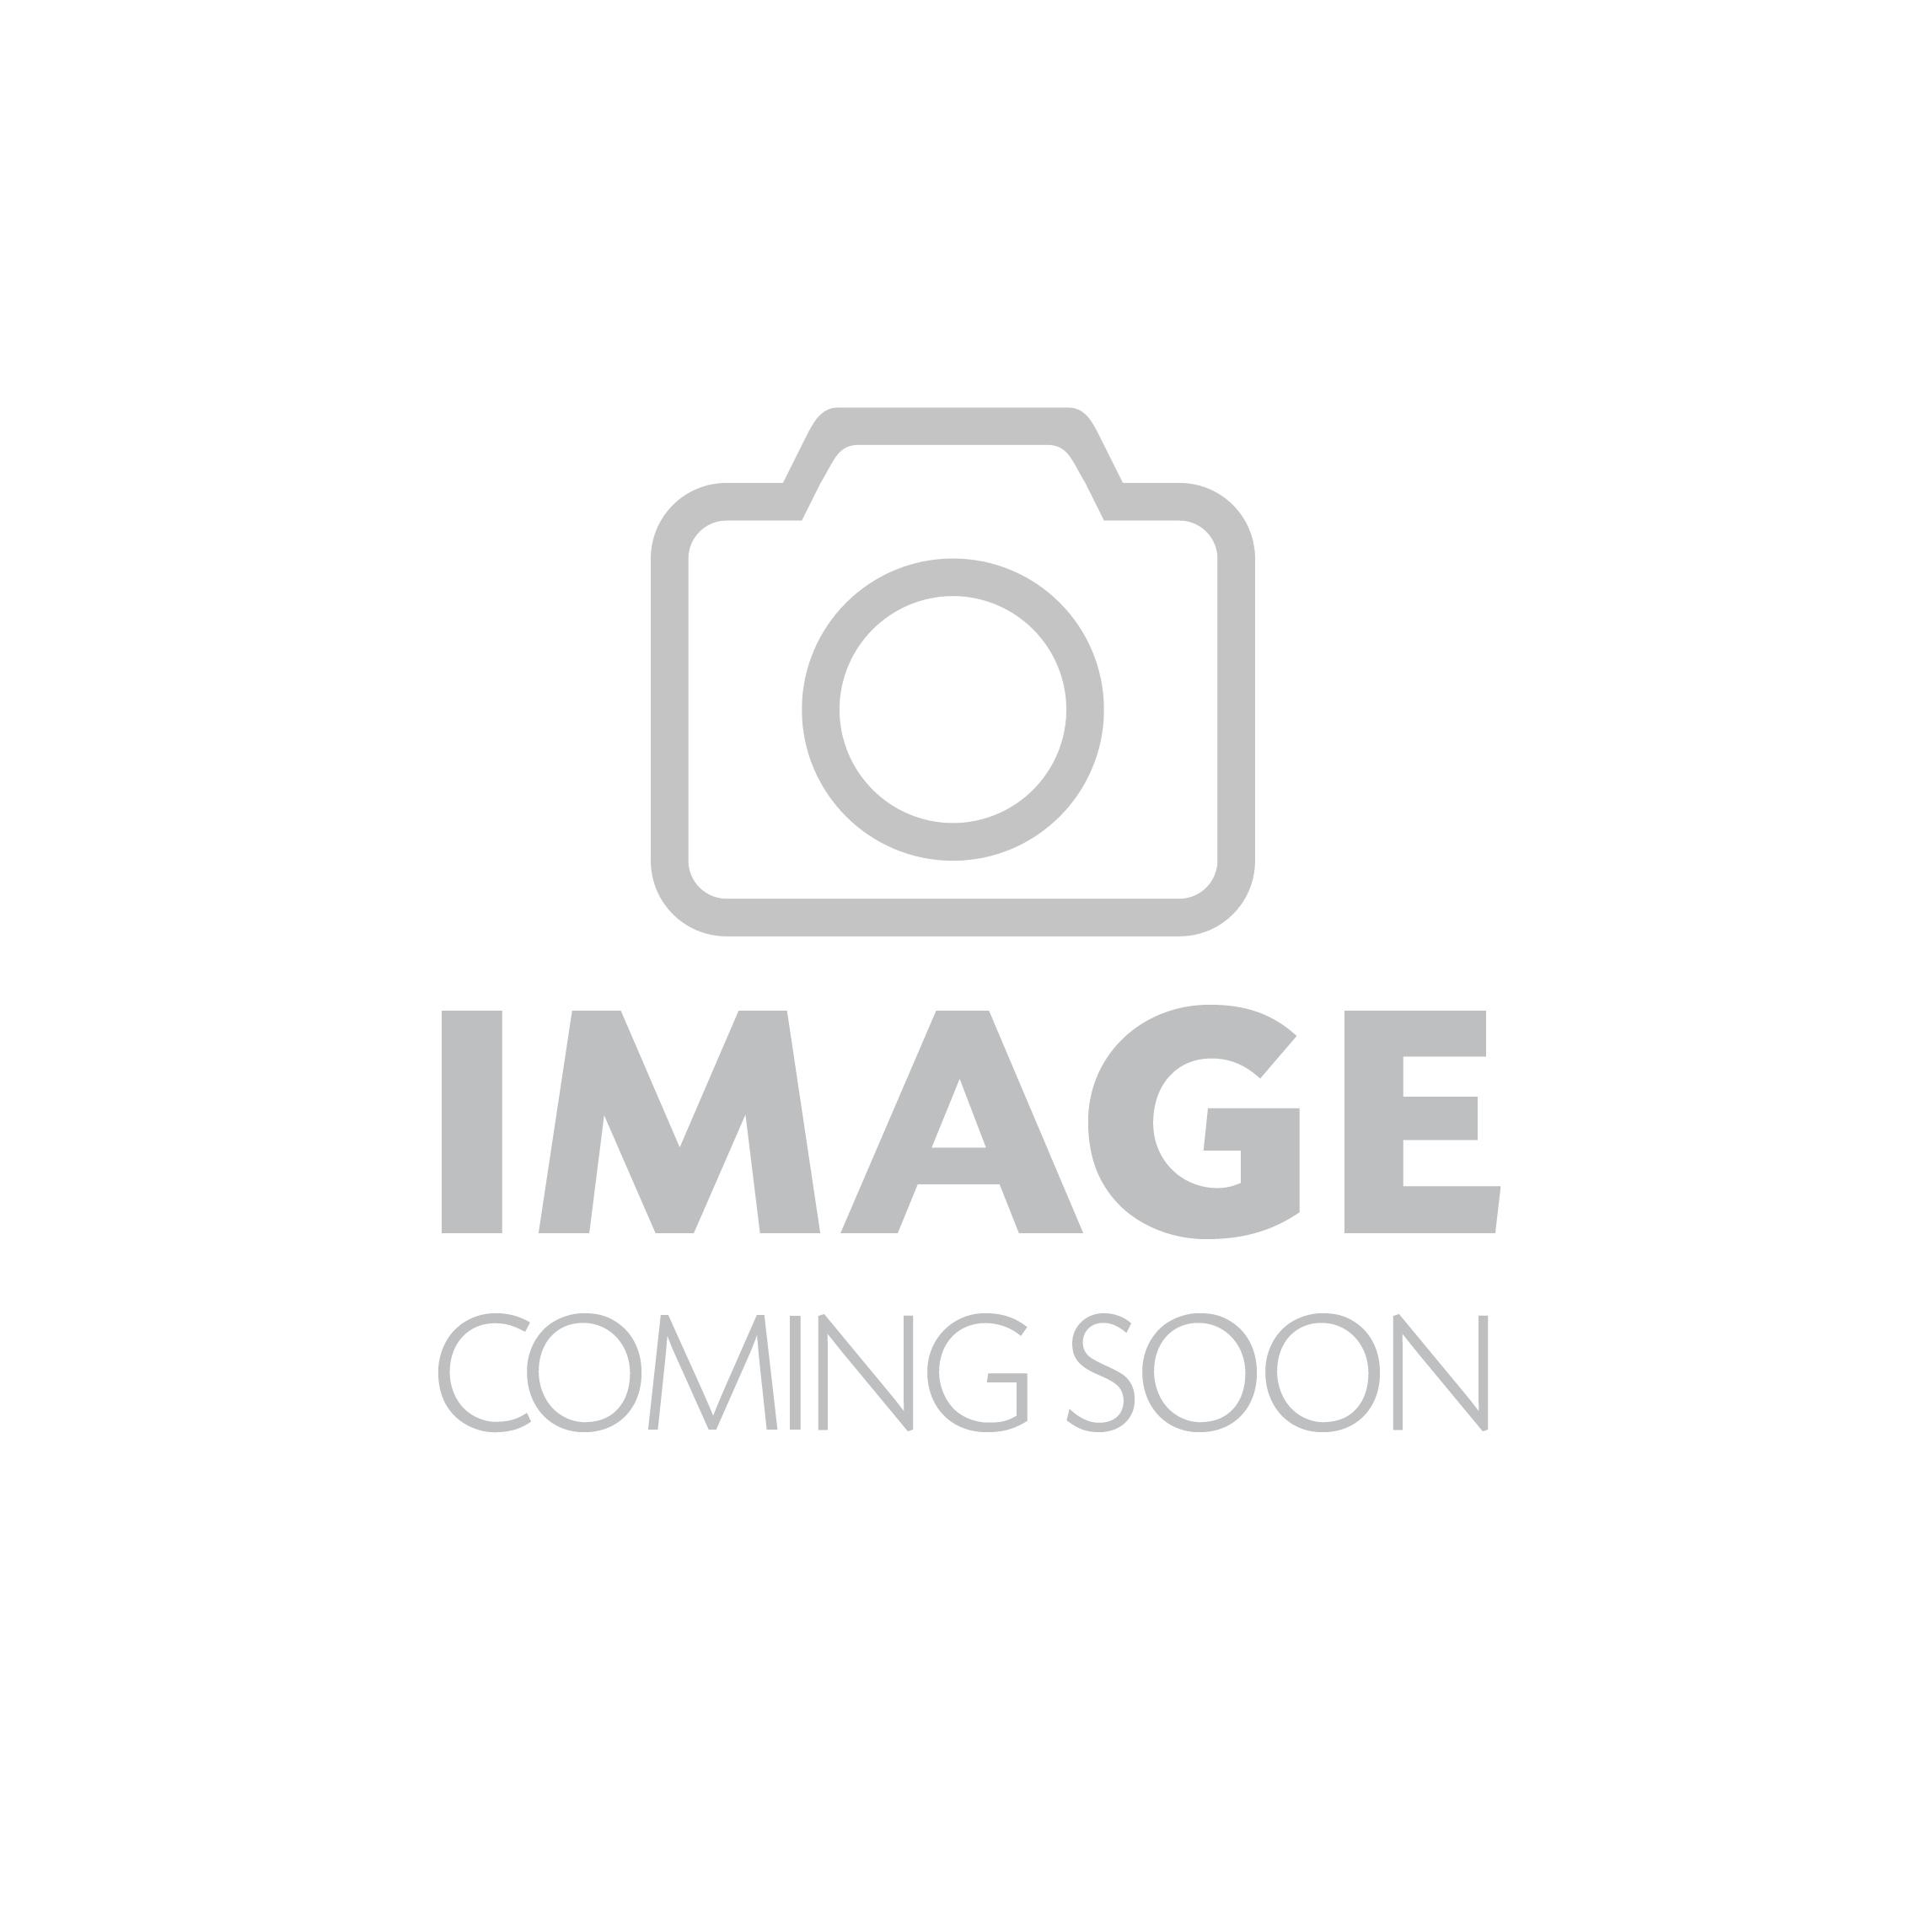 Ideal Standard Sandringham 21 450mm 1 Taphole Basin with Full Pedestal